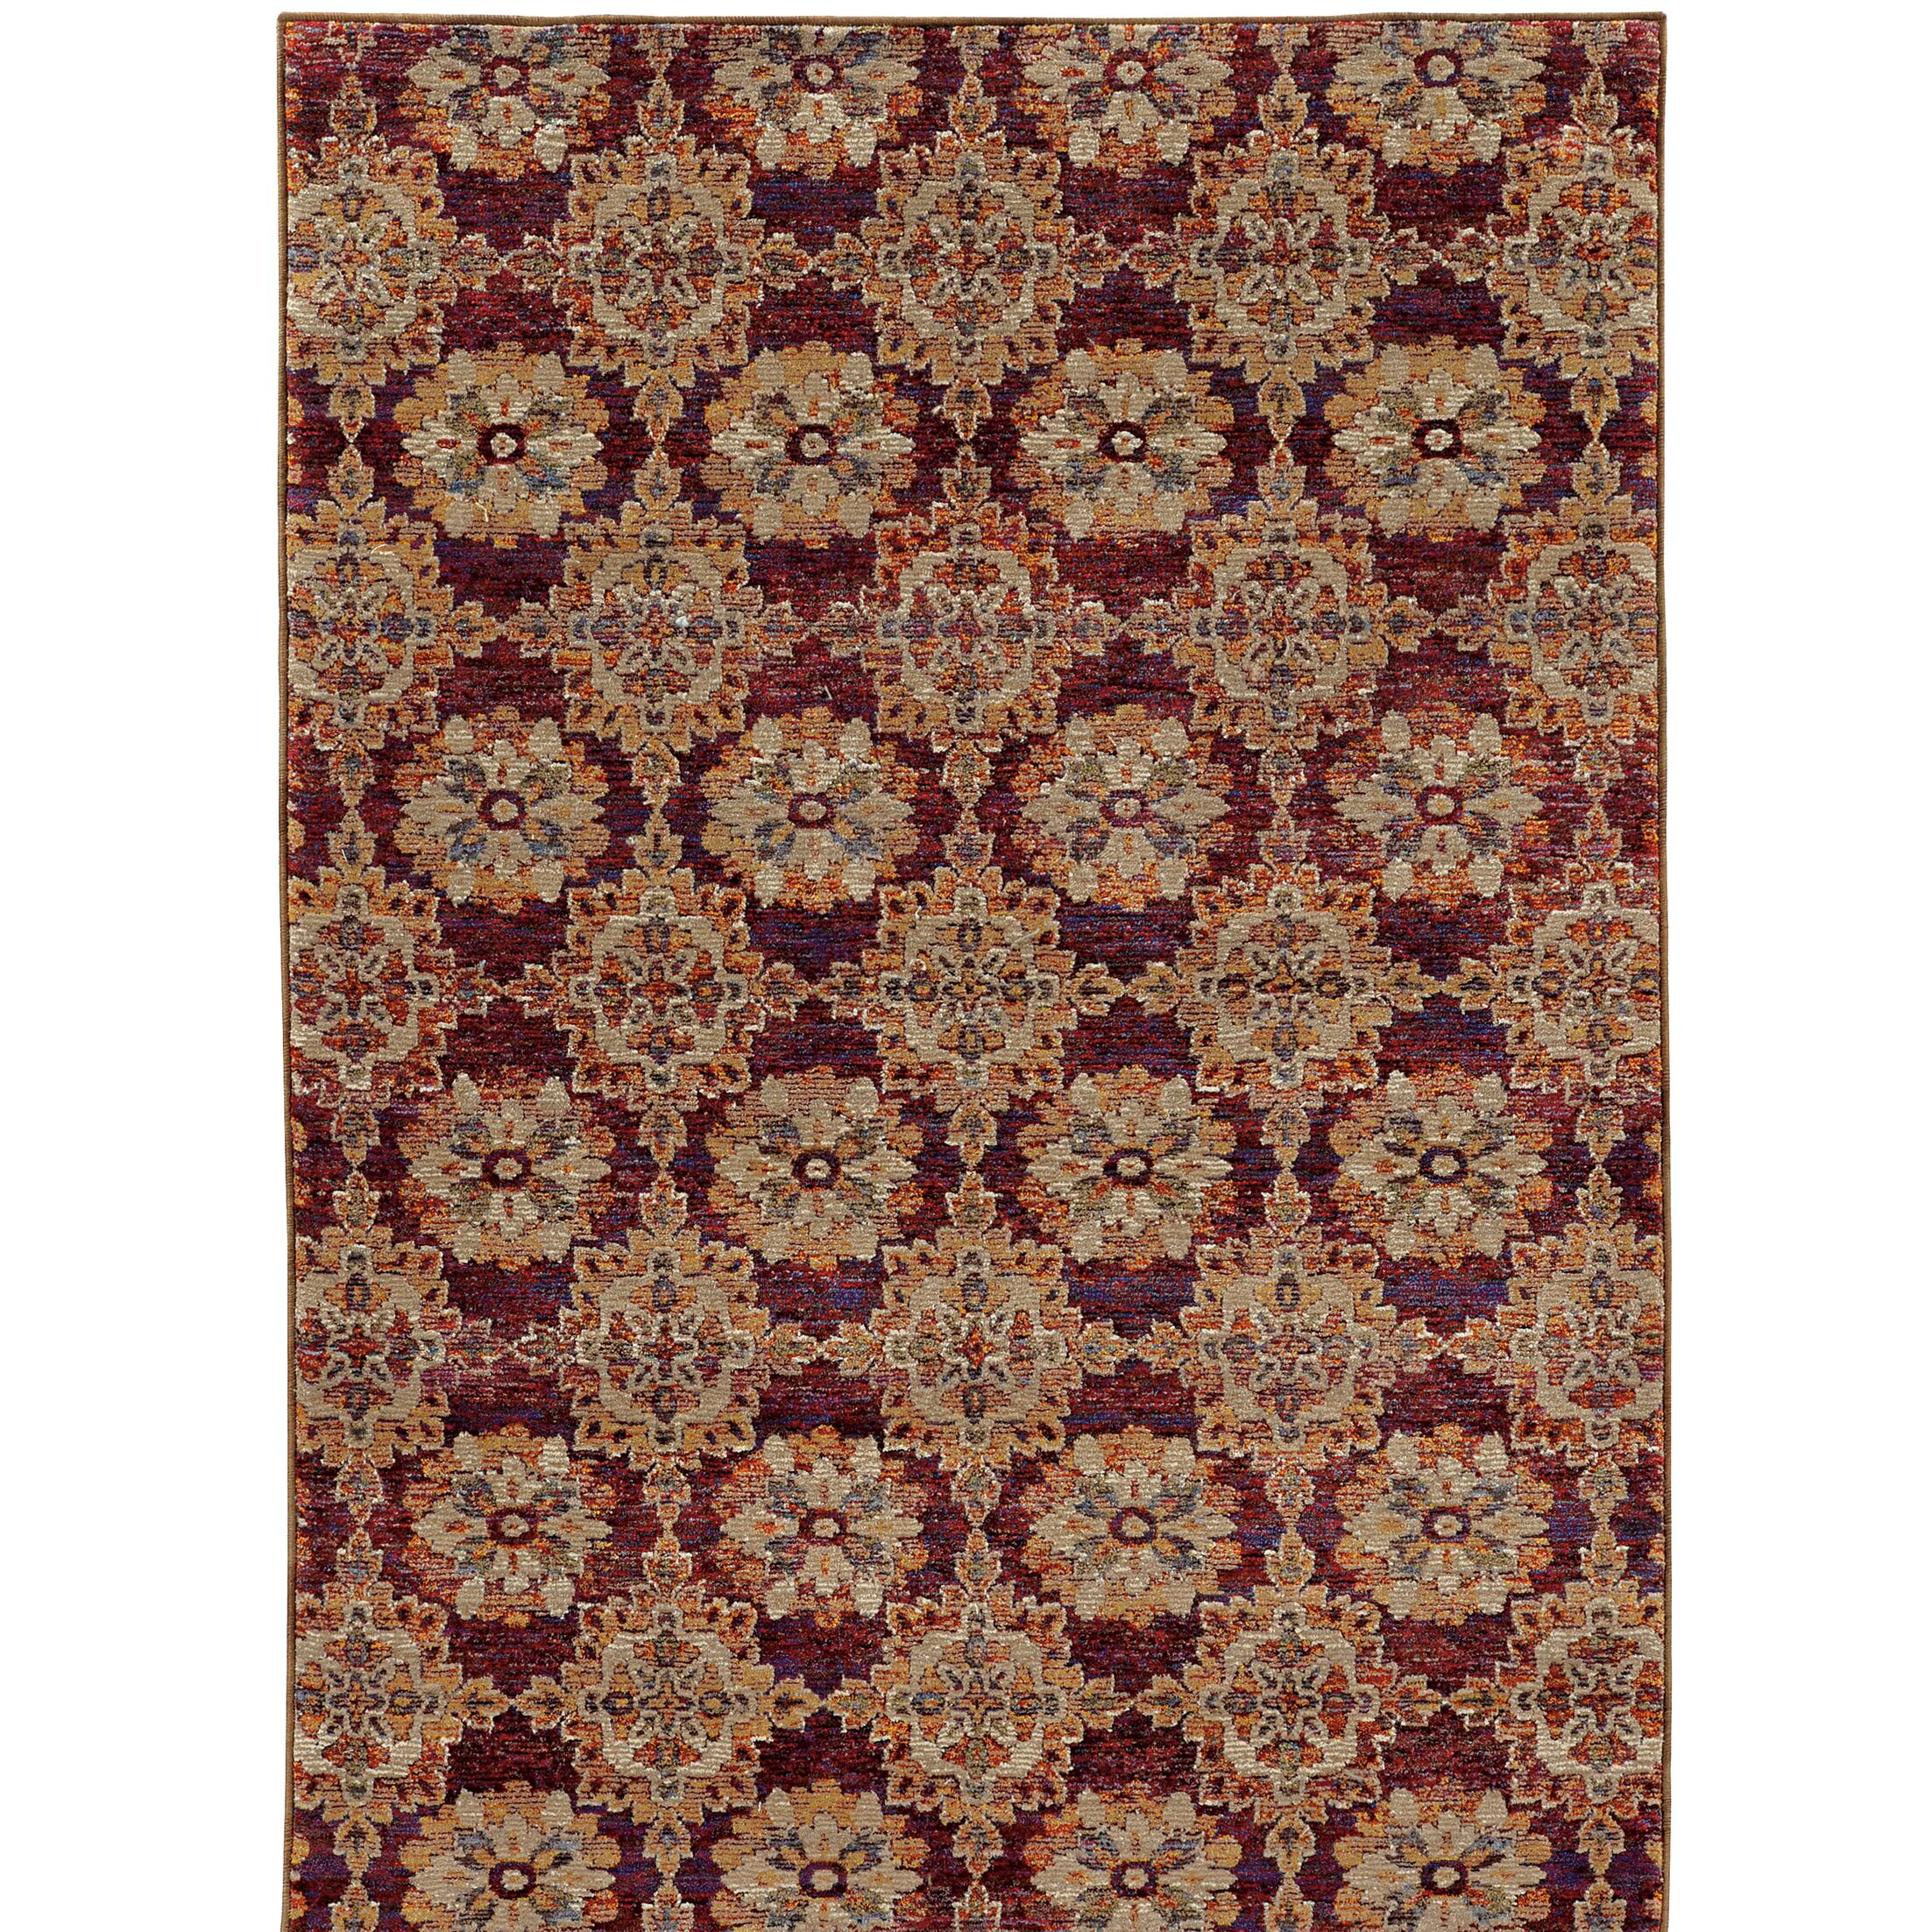 Rosalia Red/Orange Area Rug Rug Size: Rectangle 8'6